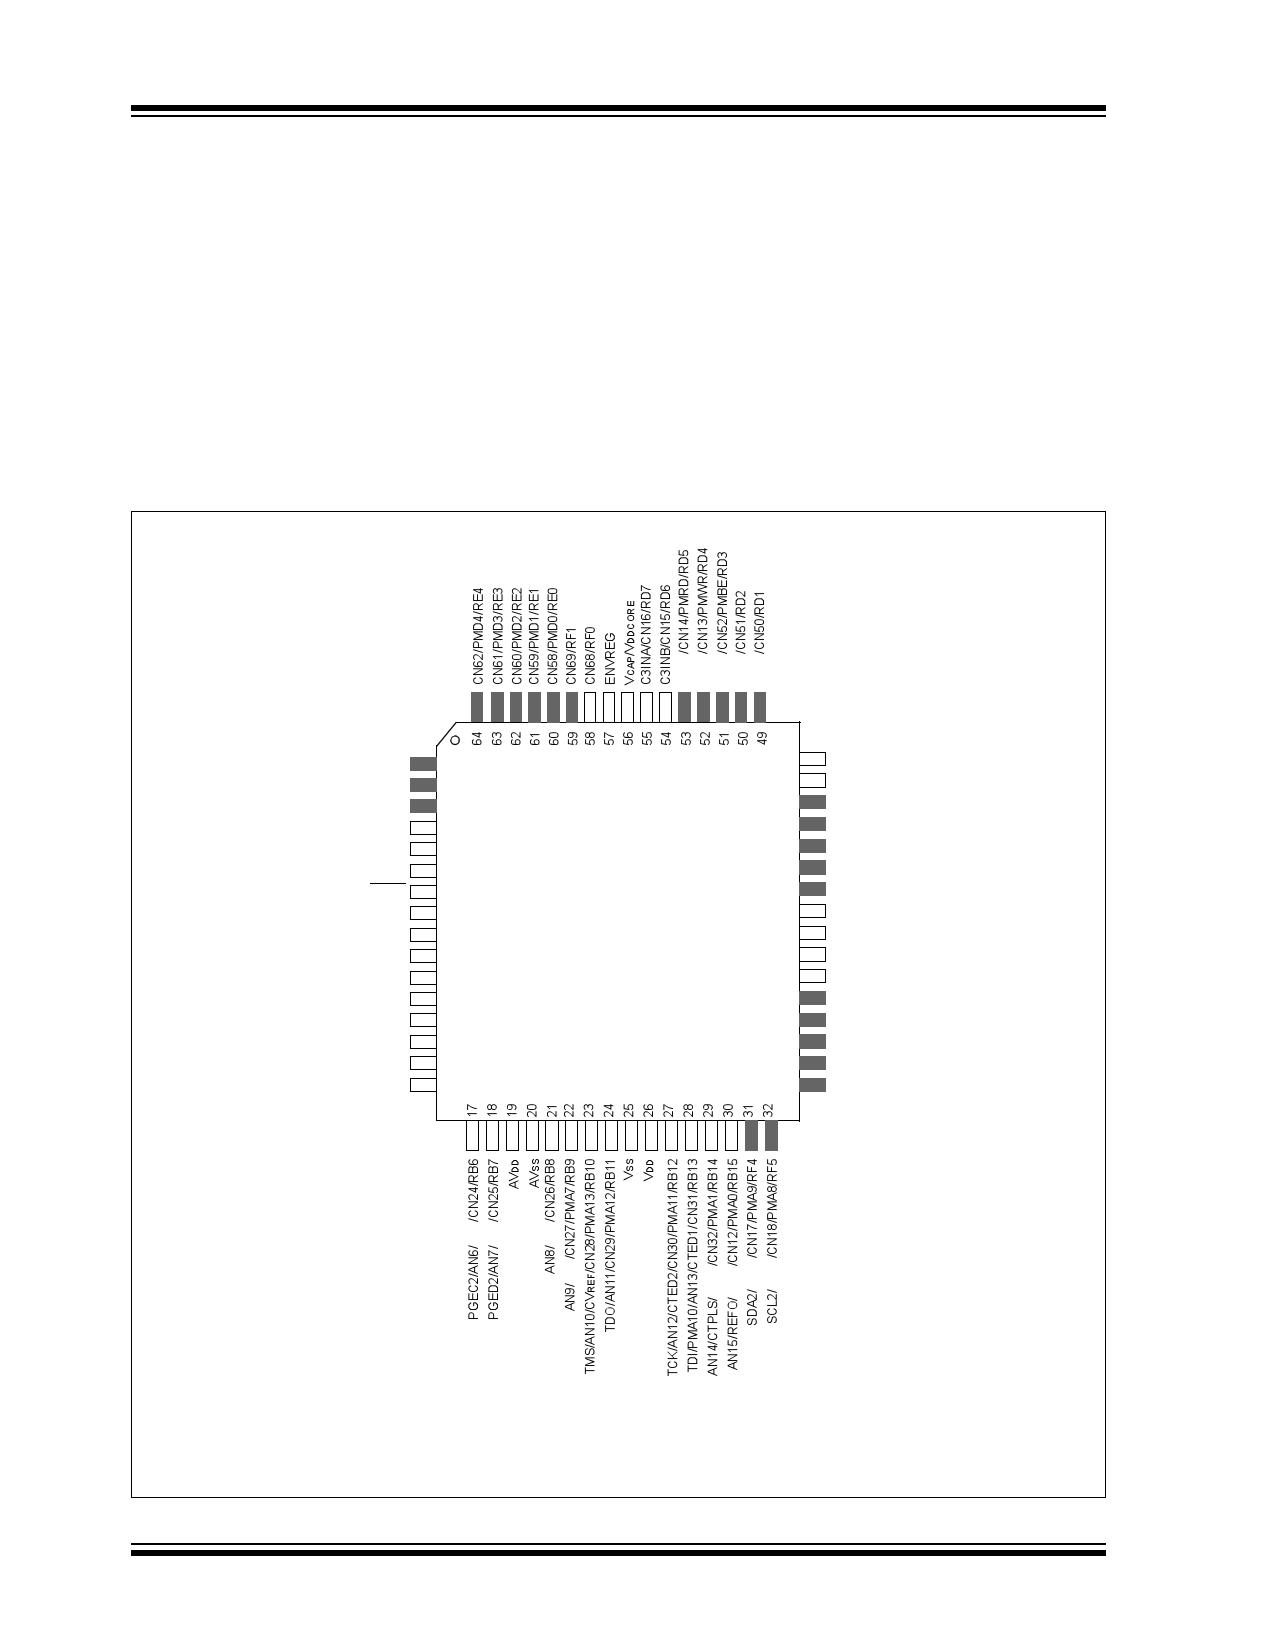 PIC24FJ64GA106 pdf, 반도체, 판매, 대치품